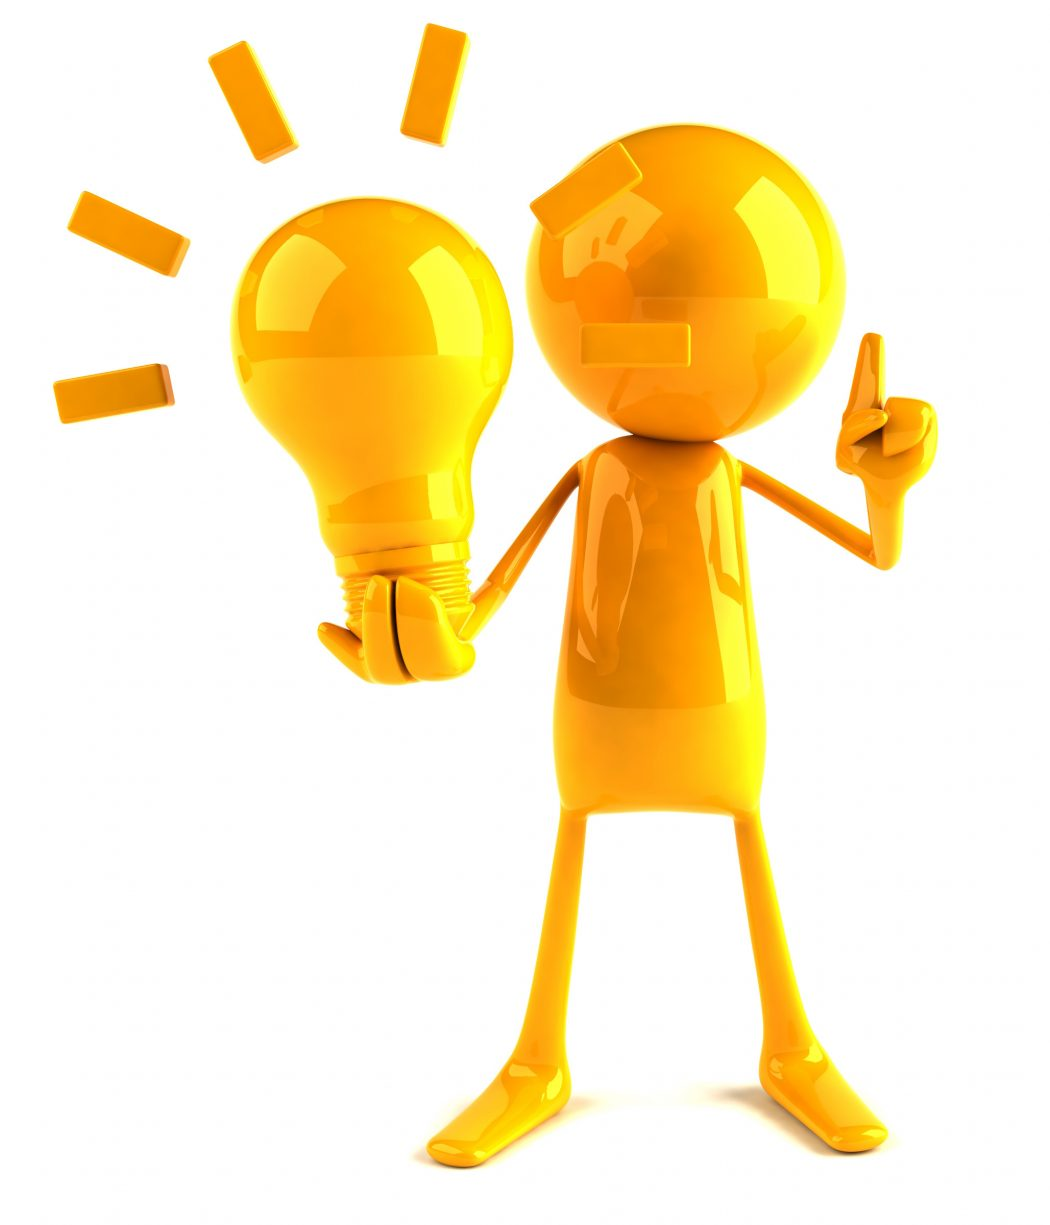 Idea Top 10 Latest Trends in Marketing Strategies